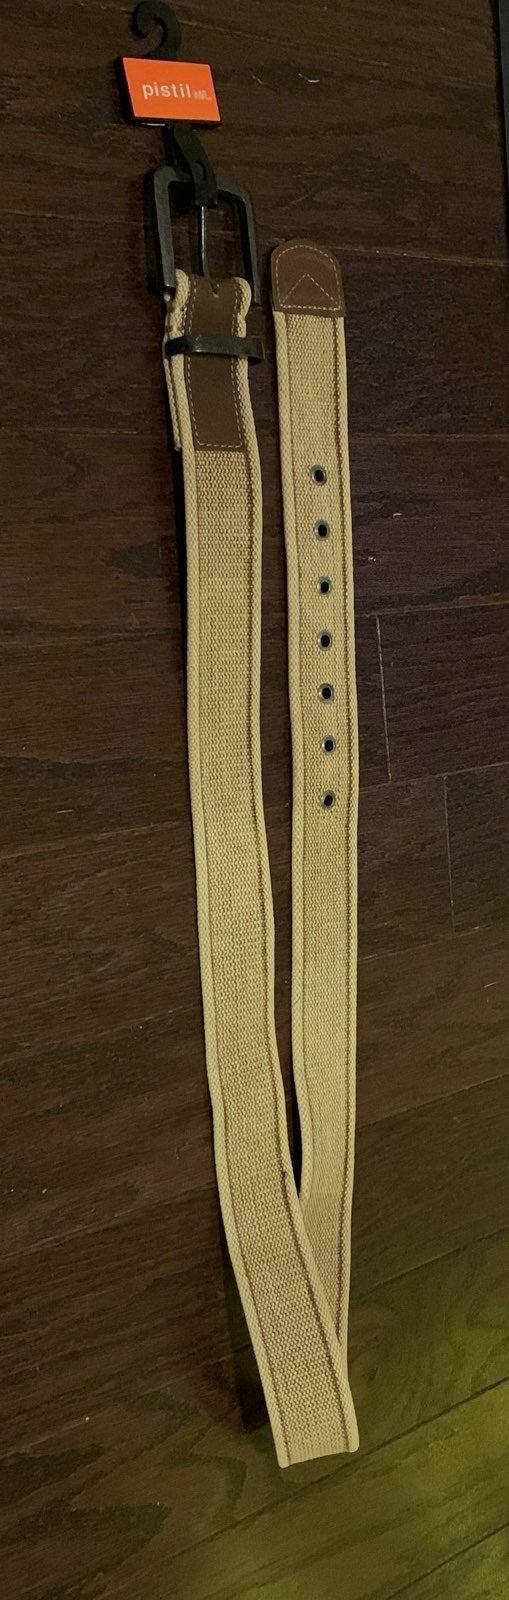 New Pistil M/L Cotton &Leather Belt